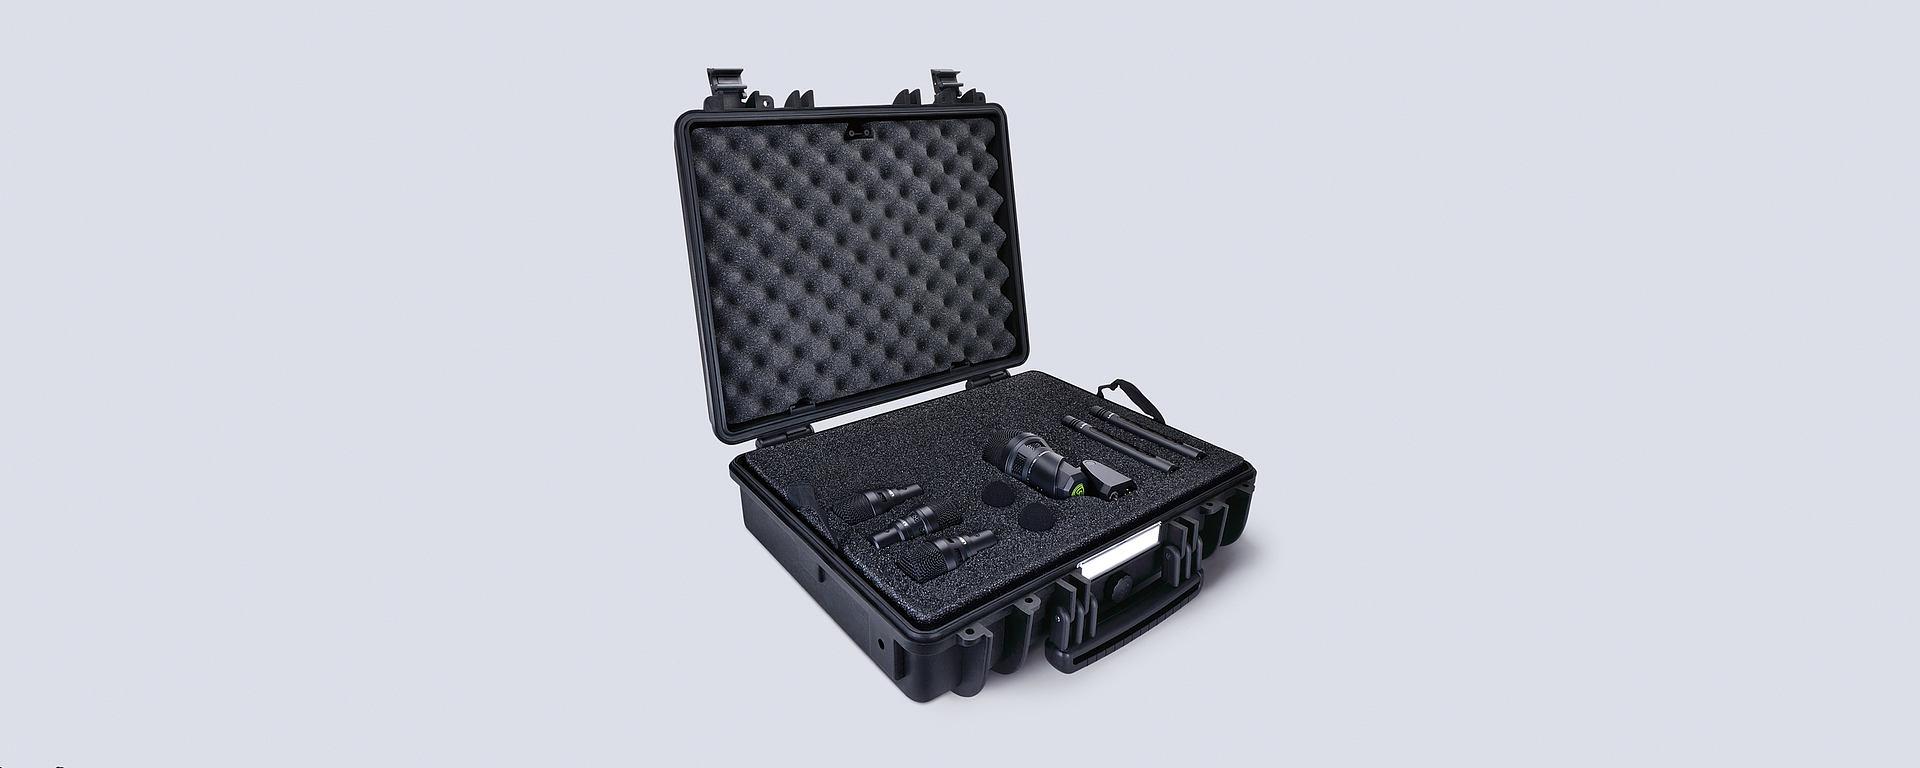 Beat Kit 6 box content